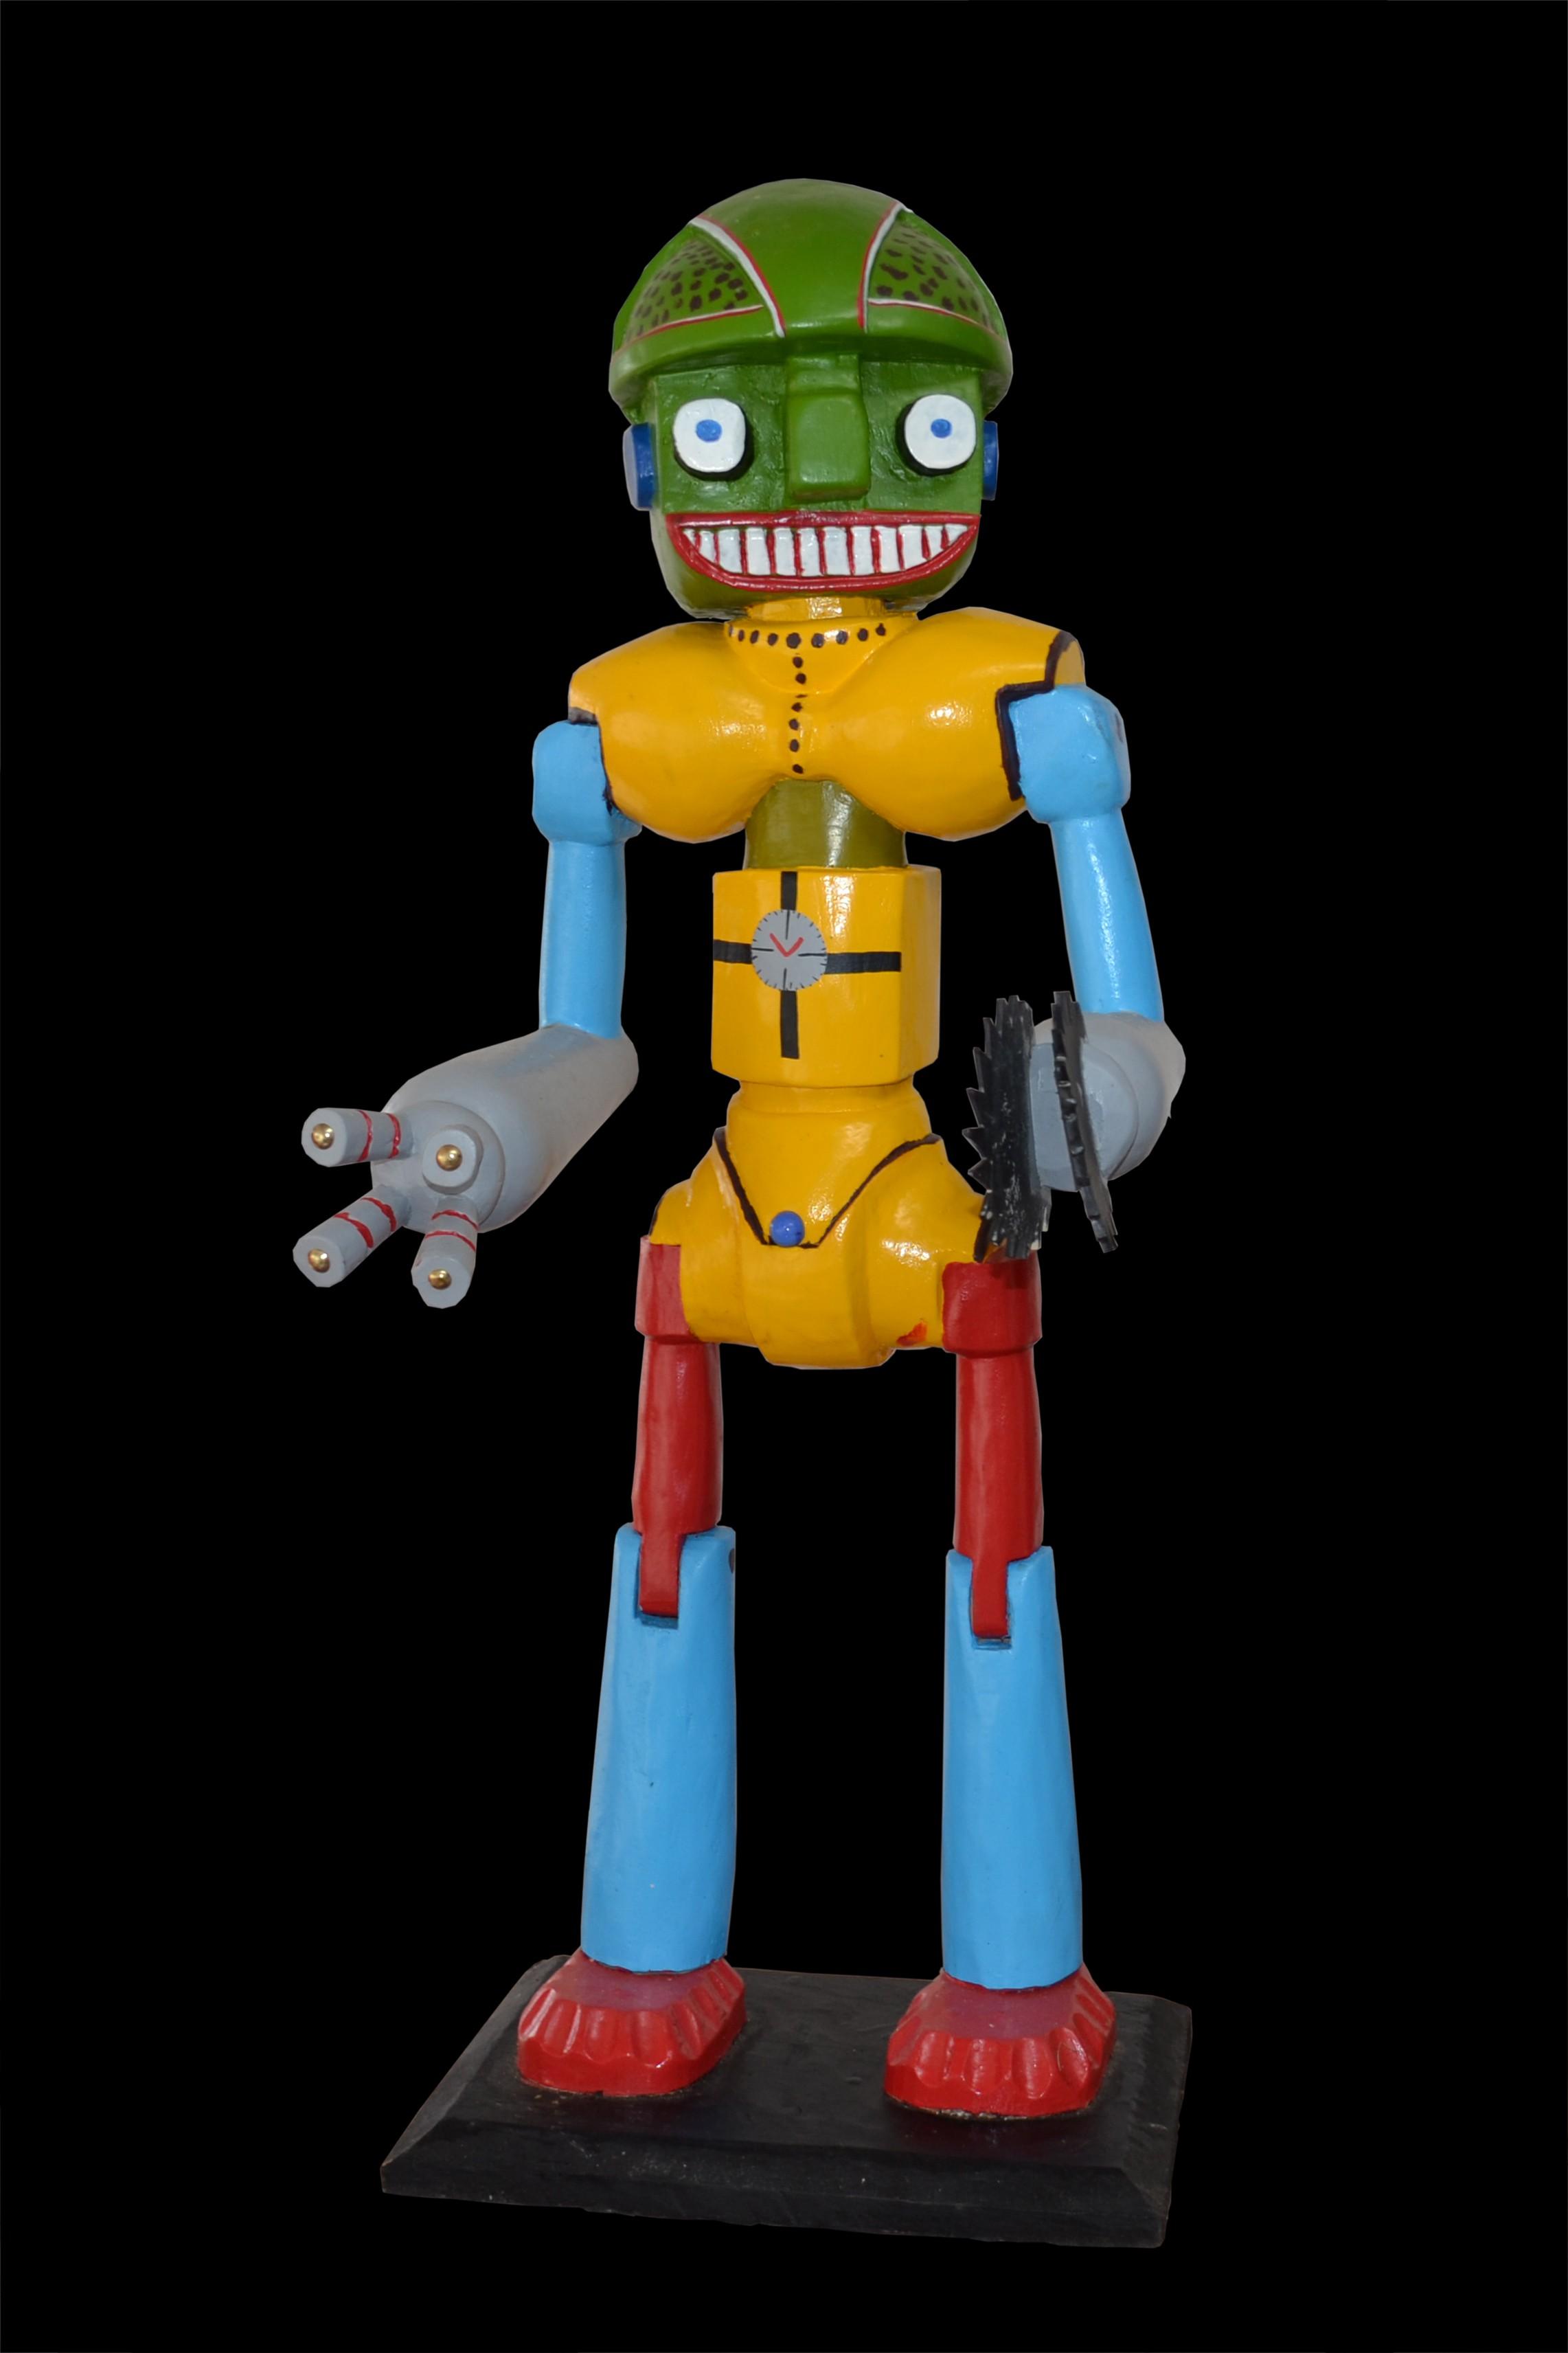 Robot yellow with green head - Sculpture polychrome - Camara Demba - 2012